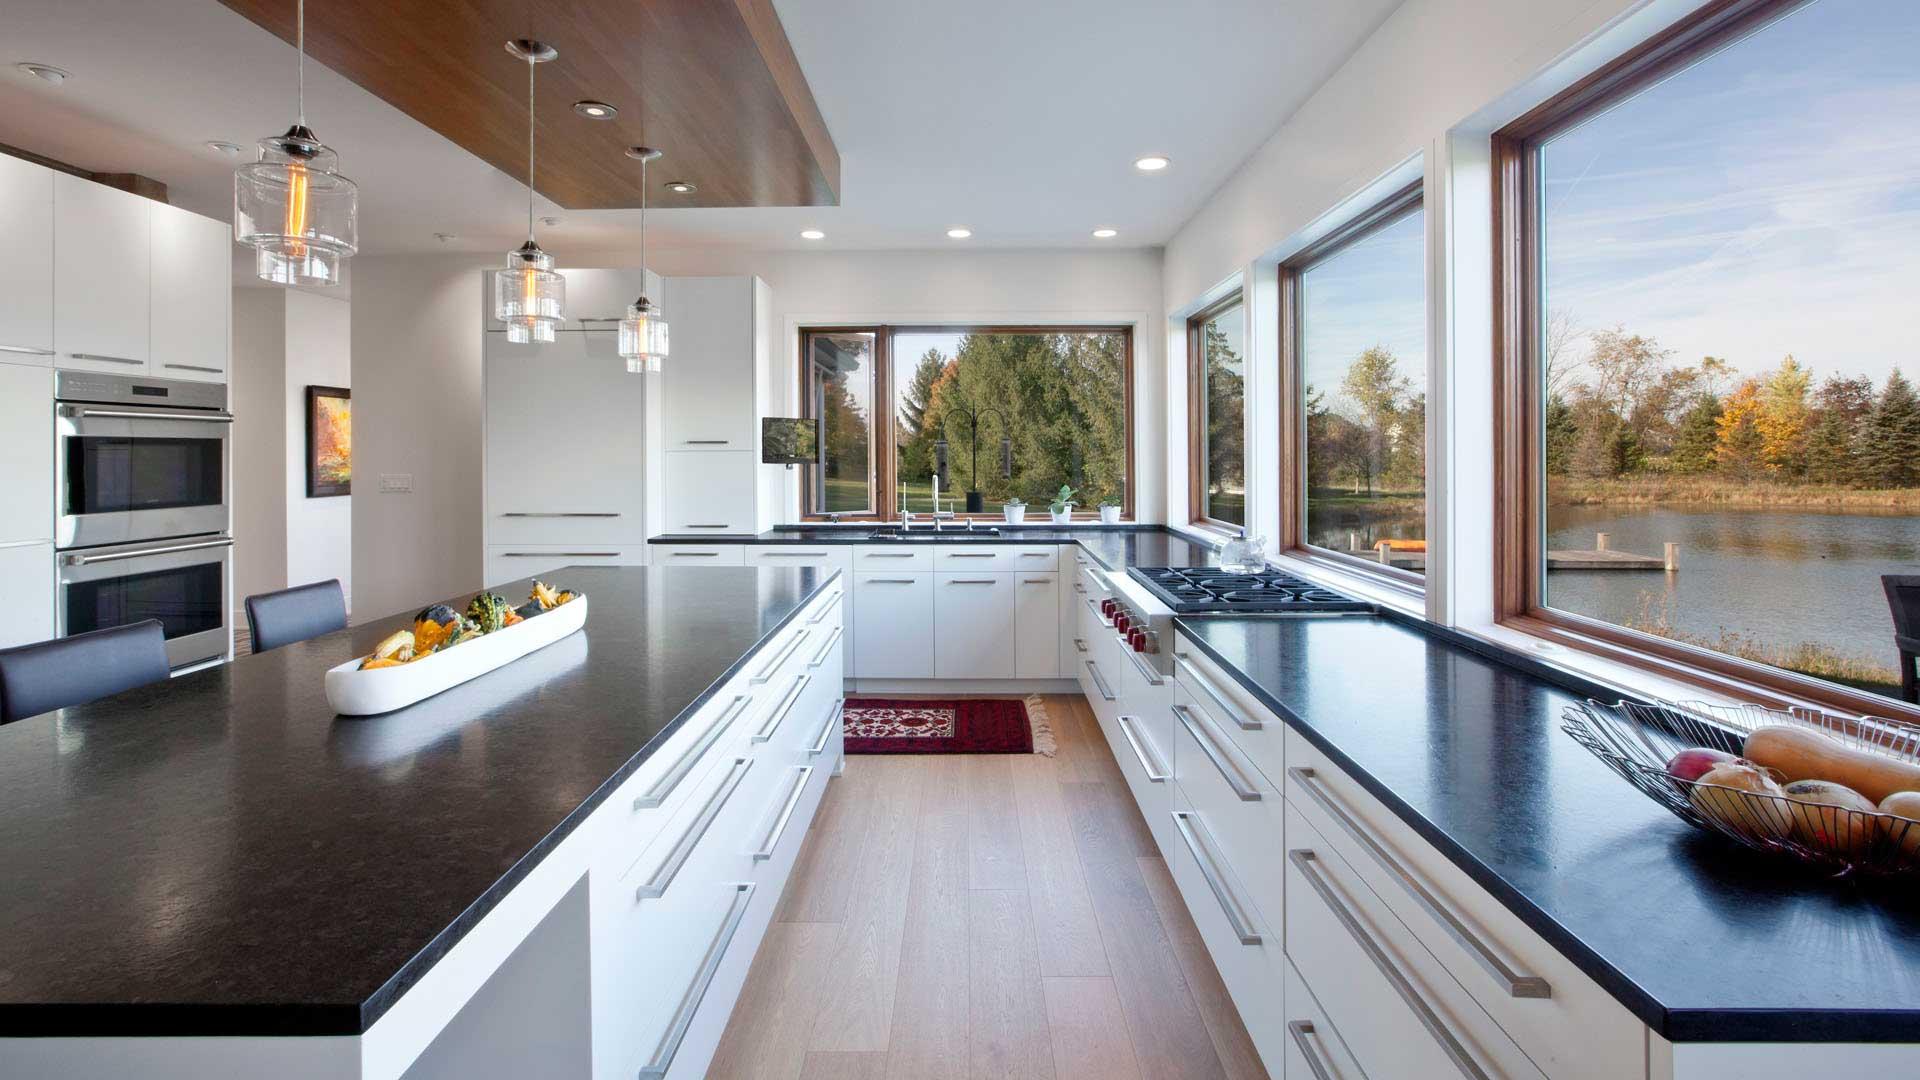 Scandinavian Rustic Cabin - Kitchen View - Christopher Short, Architect, Indianapolis, HAUS Architecture